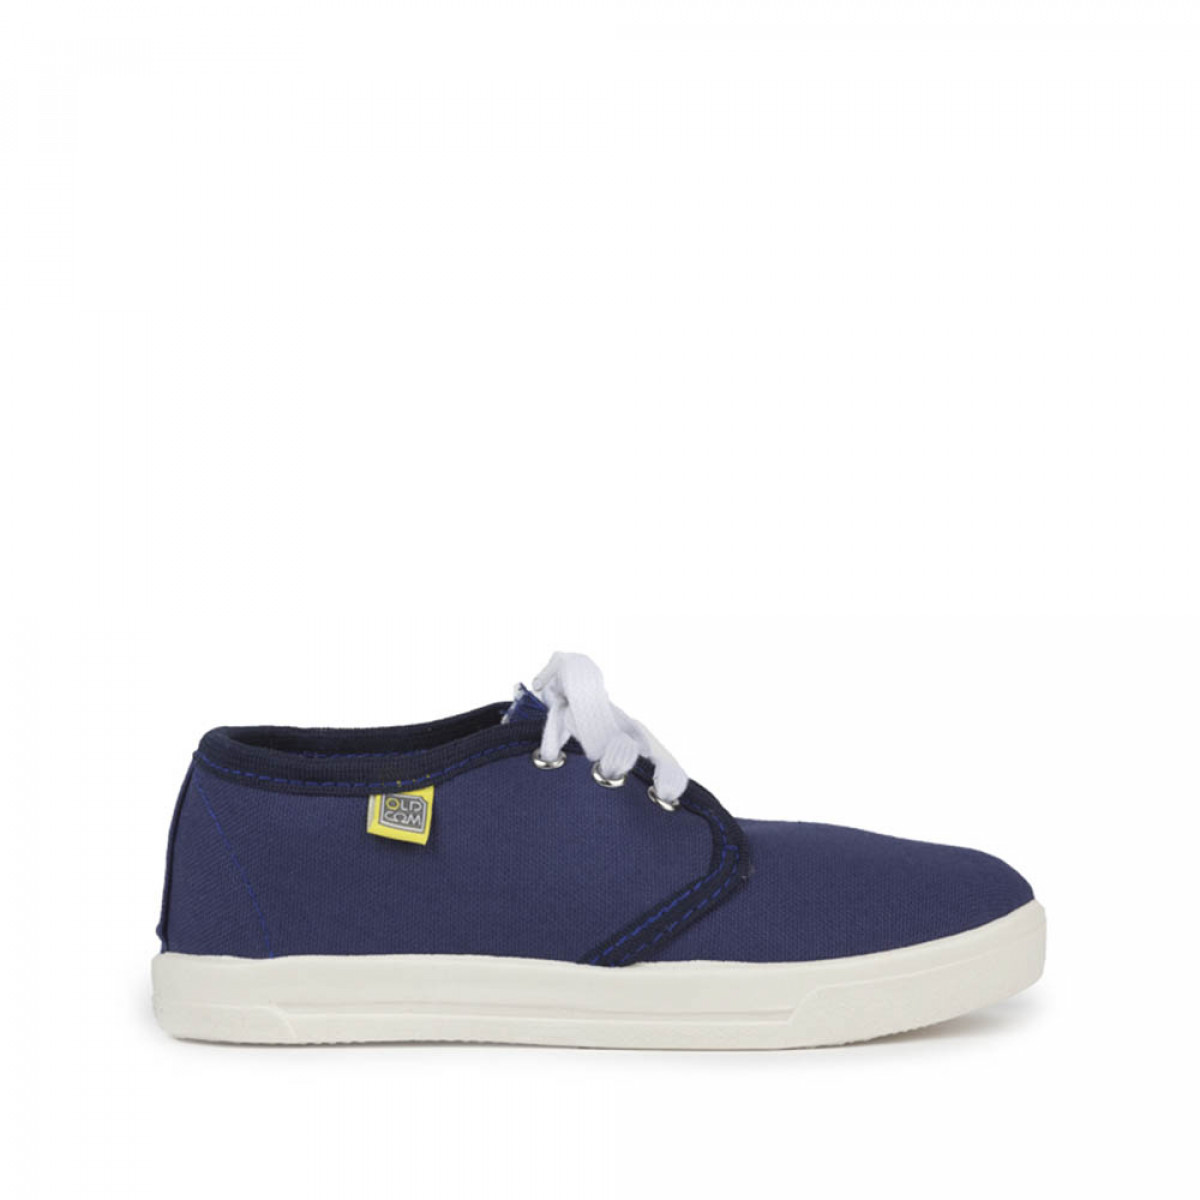 Kid's Sneakers DERBY, Blue